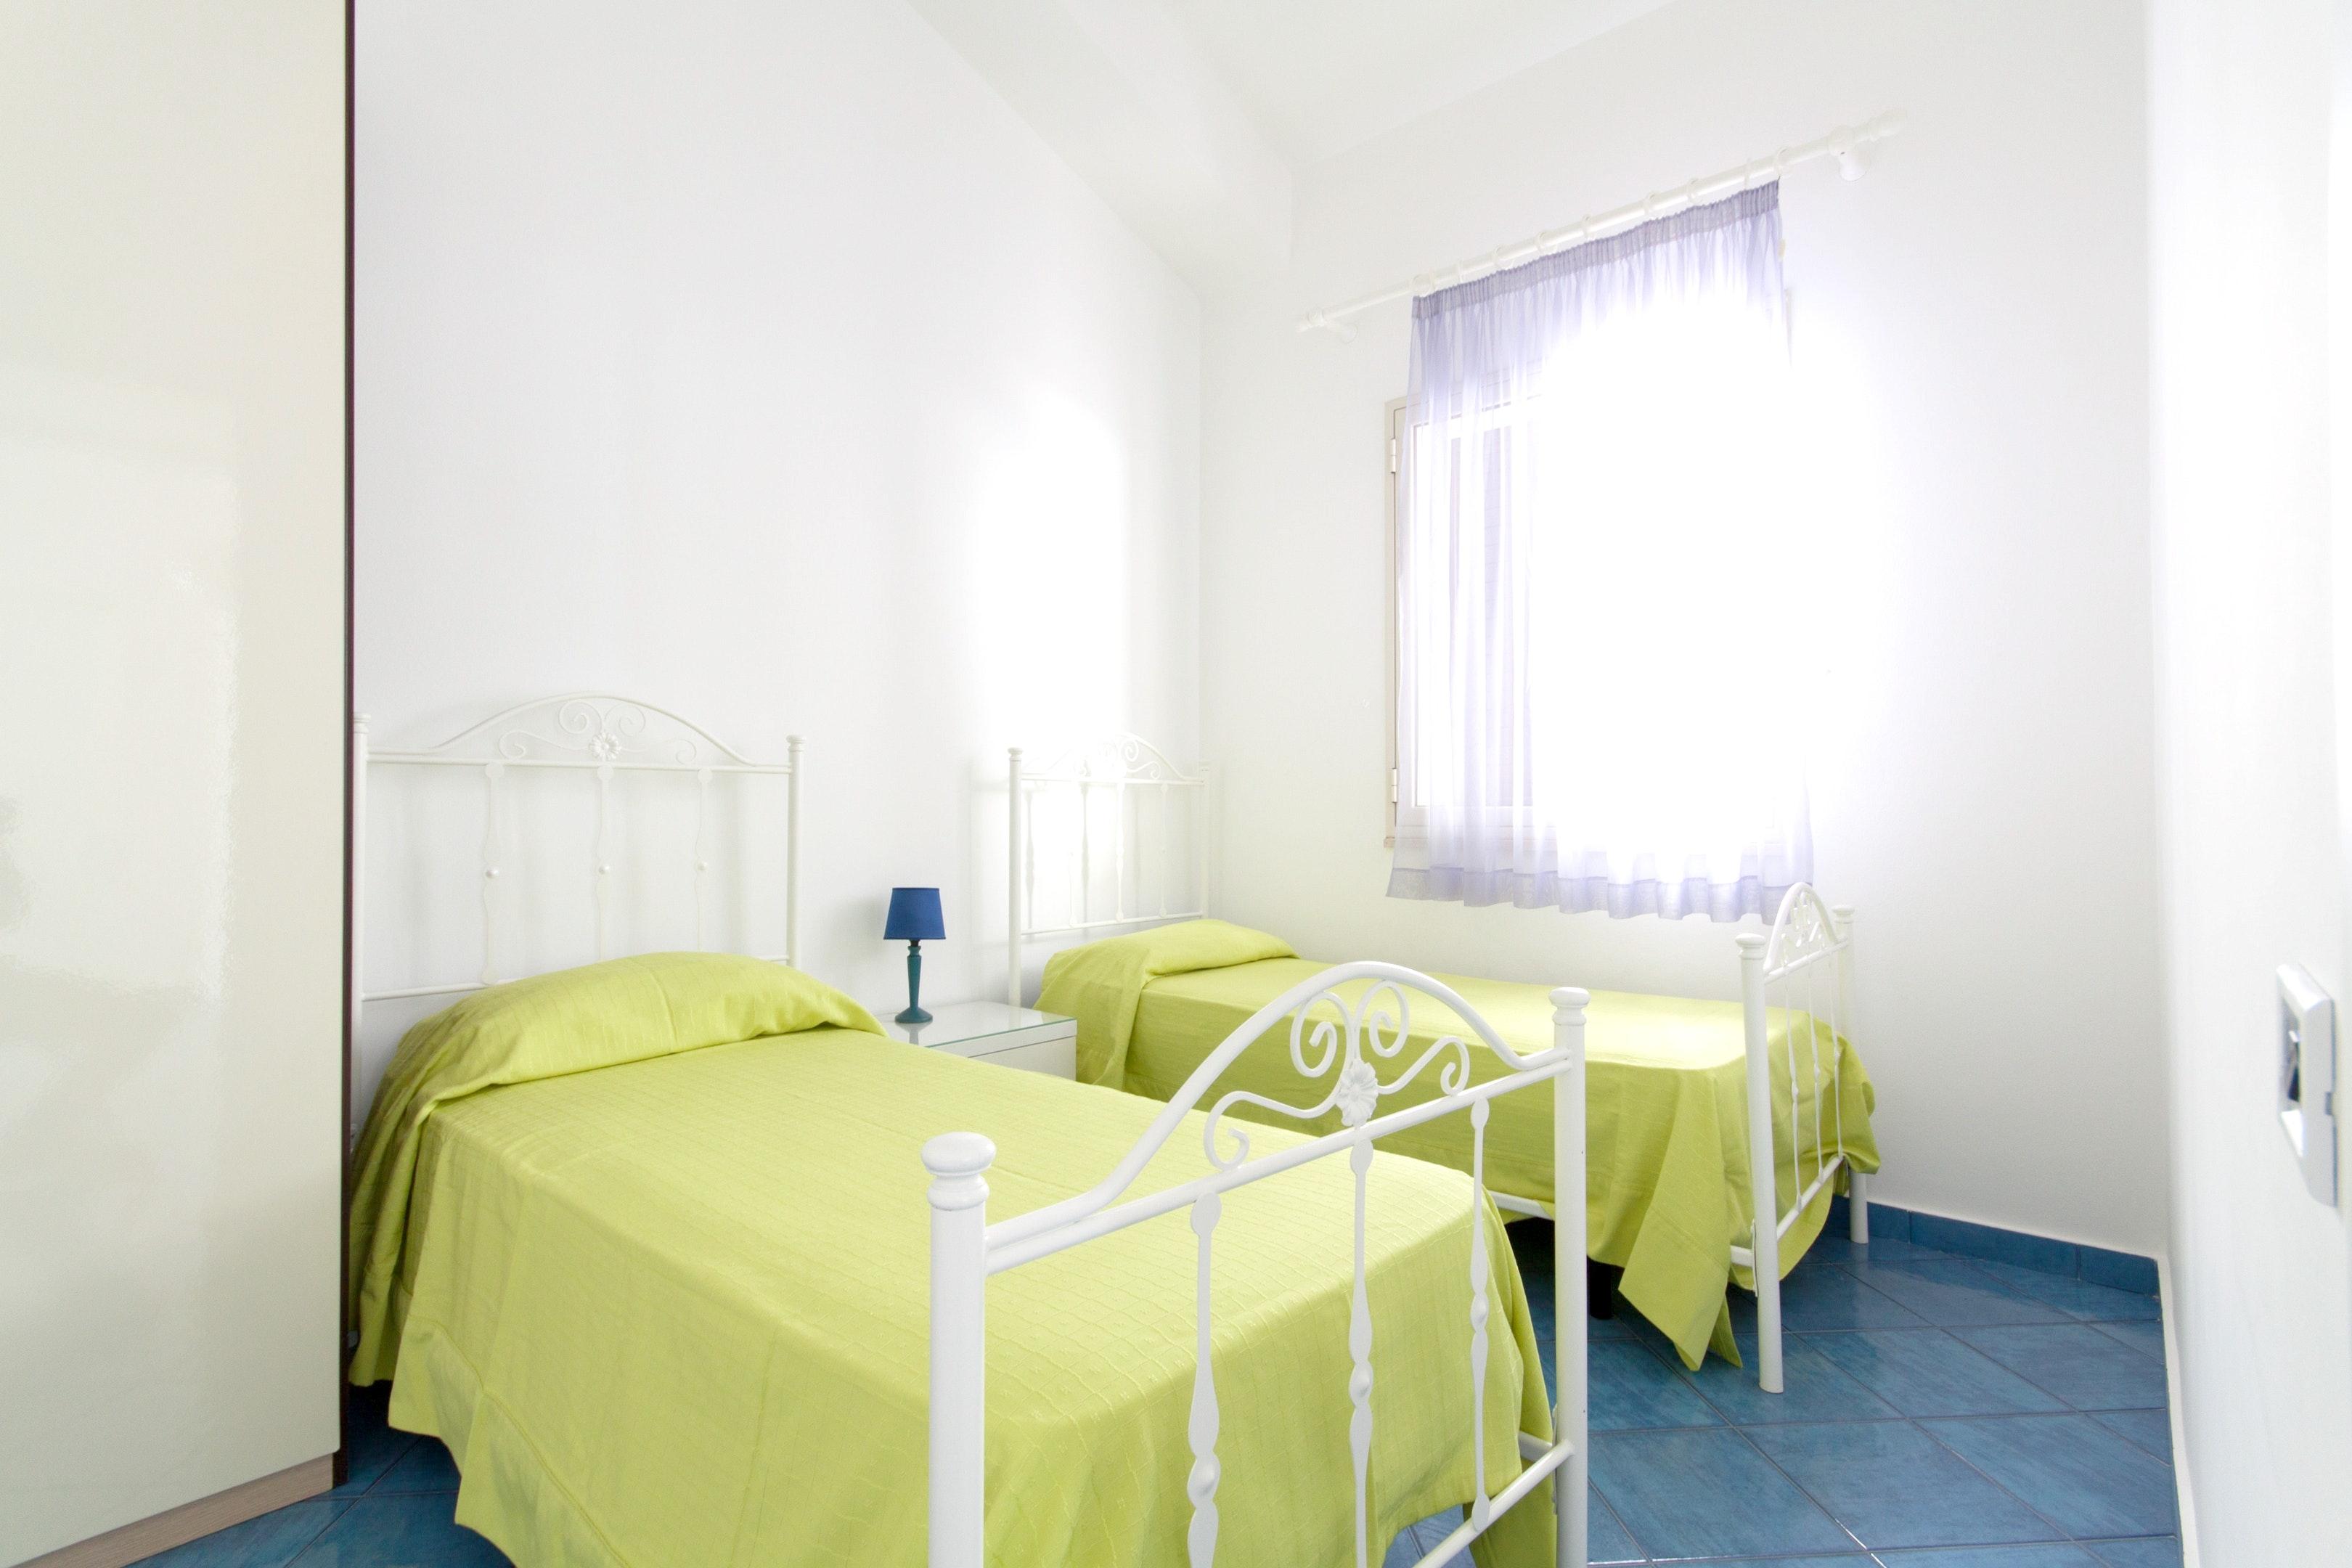 Holiday apartment Wohnung mit 3 Schlafzimmern in Piano di Trappeto mit herrlichem Meerblick, möblierter Terr (2271436), Balestrate, Palermo, Sicily, Italy, picture 34